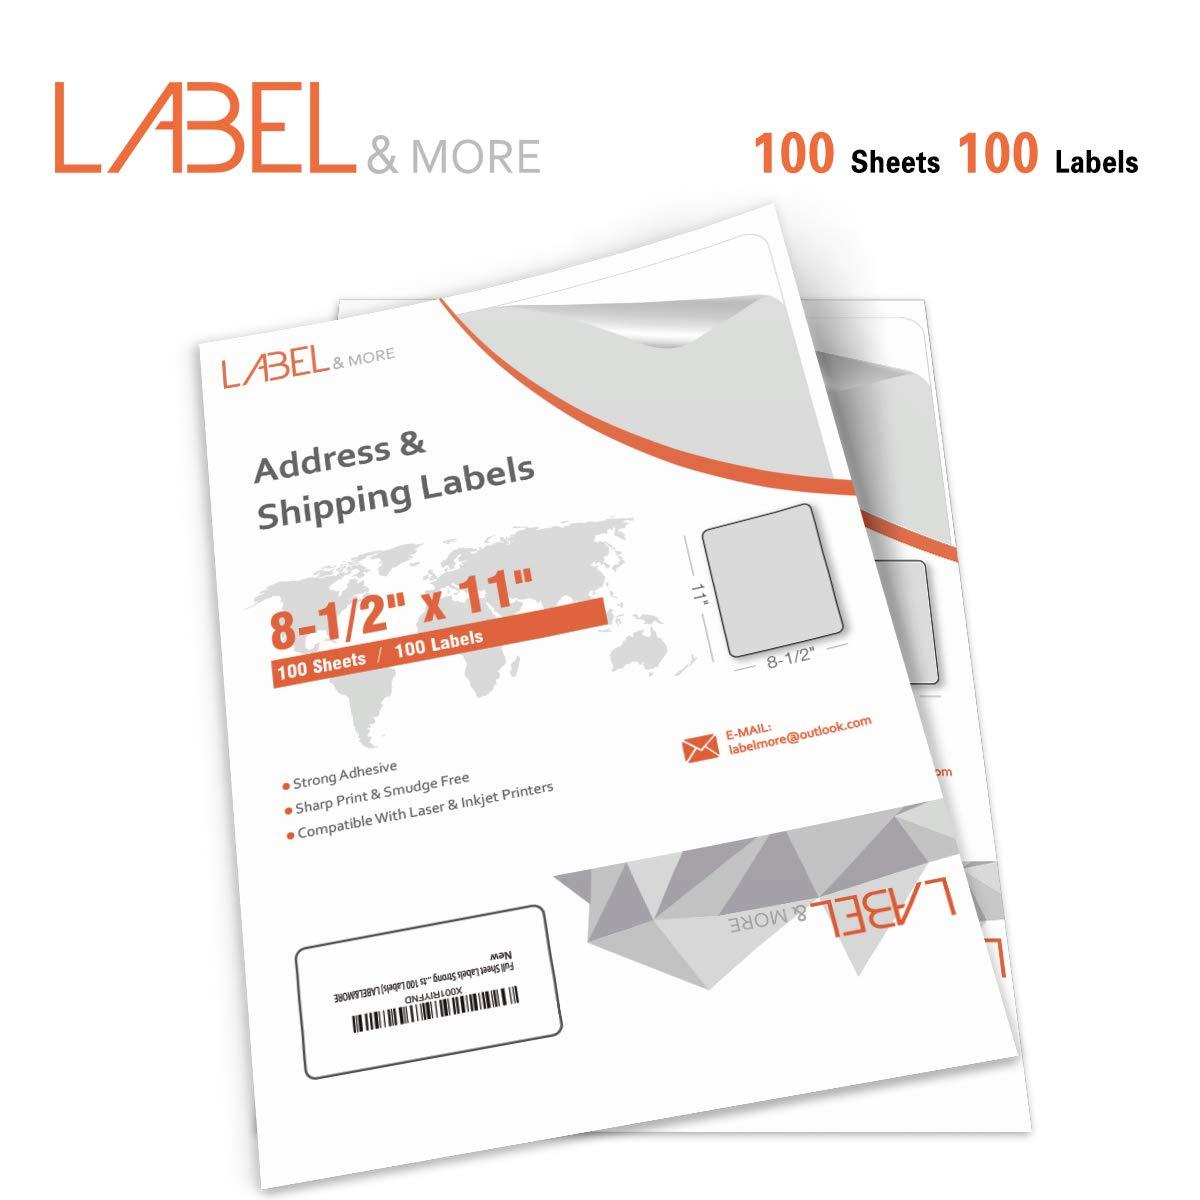 Full Sheet Labels for Laser and Inkjet Printer 8.5x11 Labels Full Sheet Label Paper UPS USPS Amazon Postage Address Shipping 1 up Labels Same Size with 5165 Labels[100 Sheets 100 Labels] Label&More